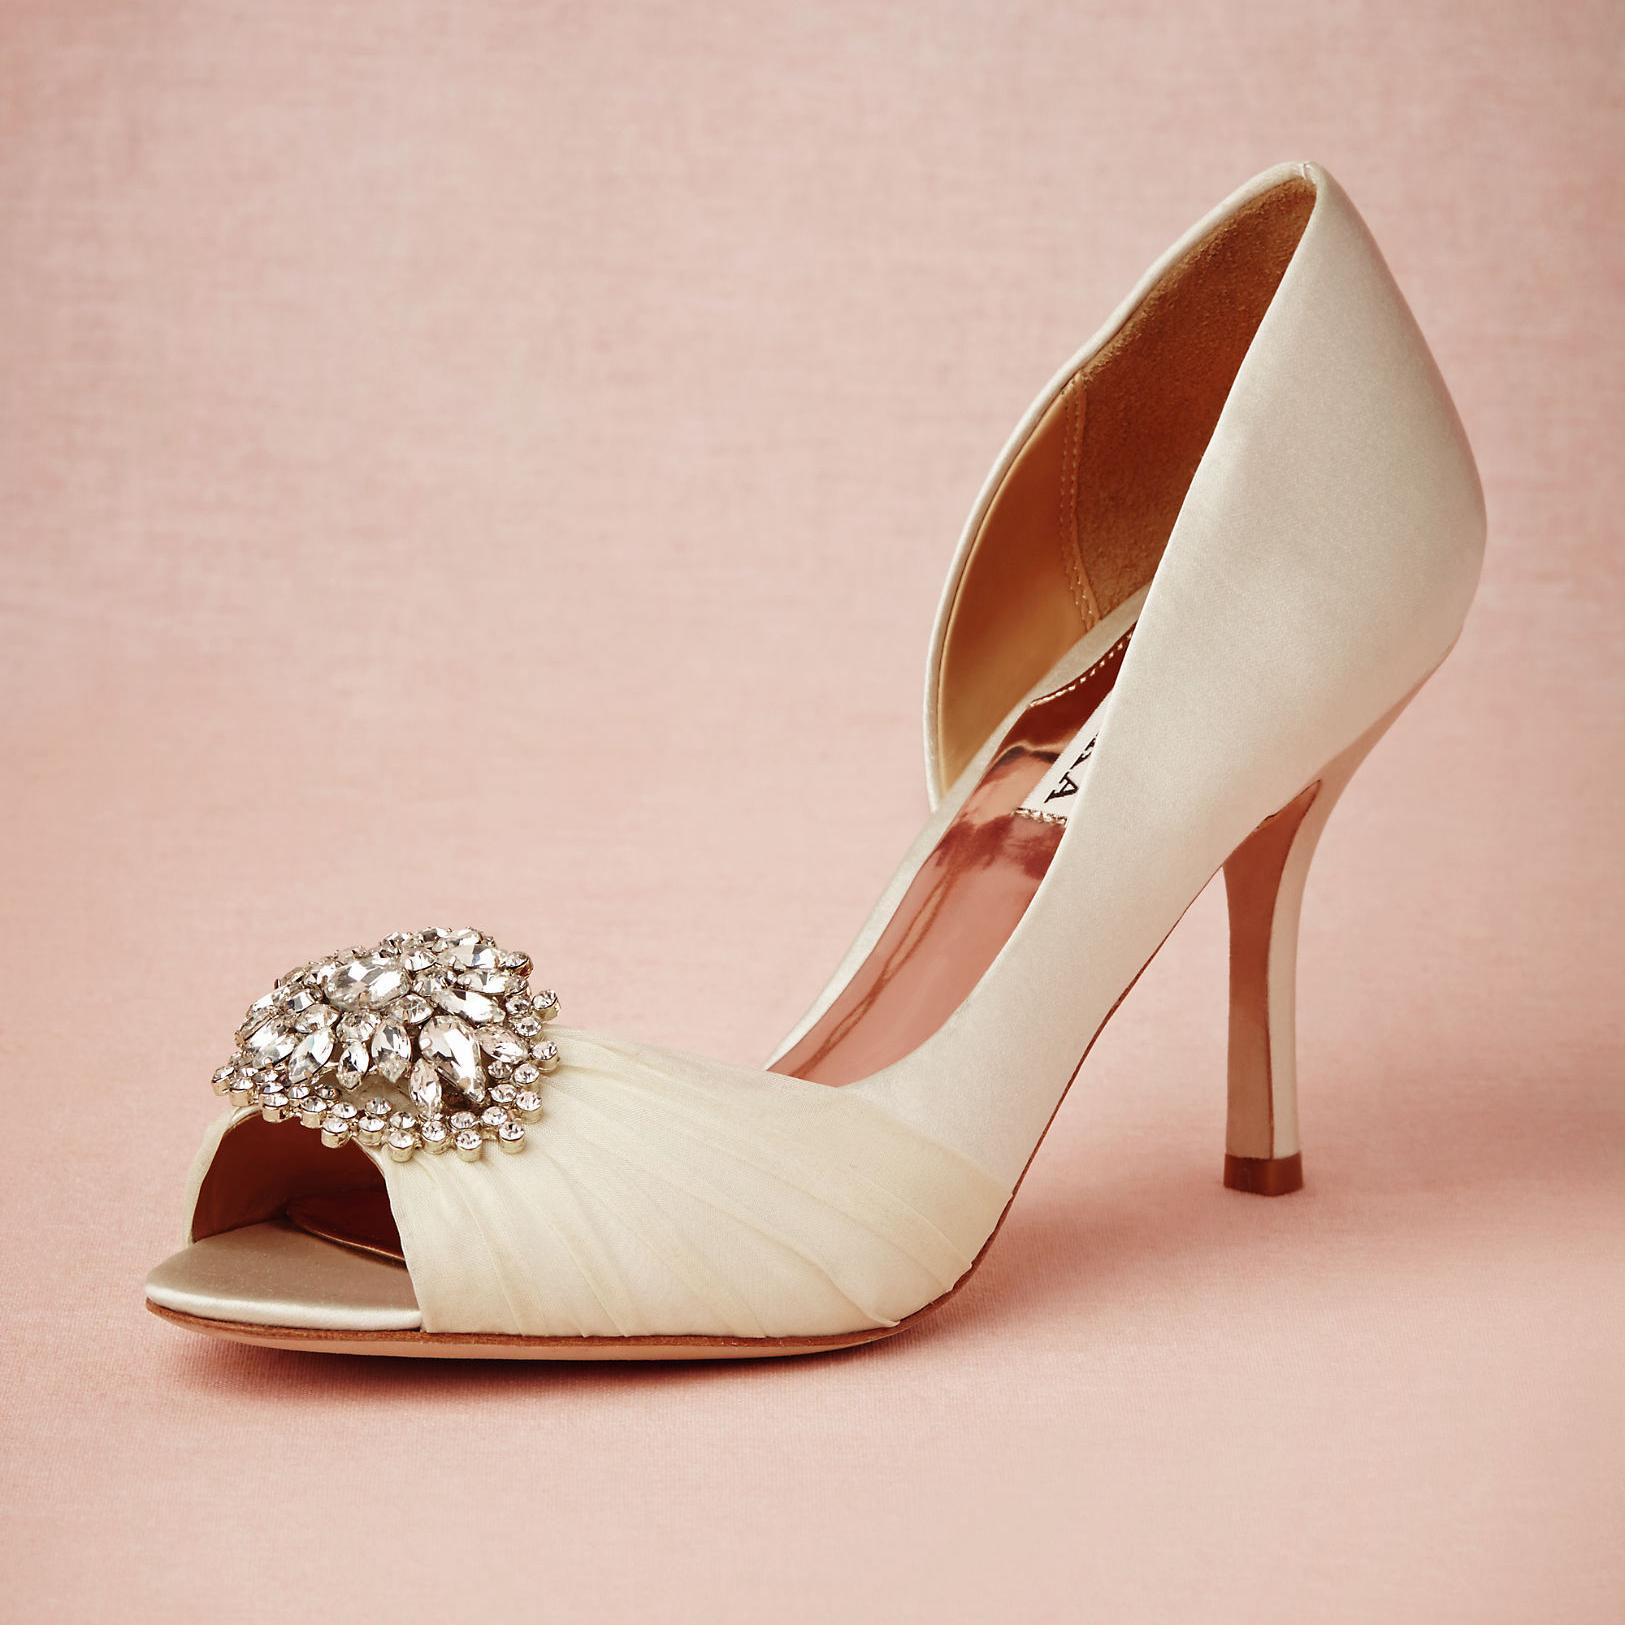 5a790dc0644 Silver Peep Toe Mid Heels - Heels Zone